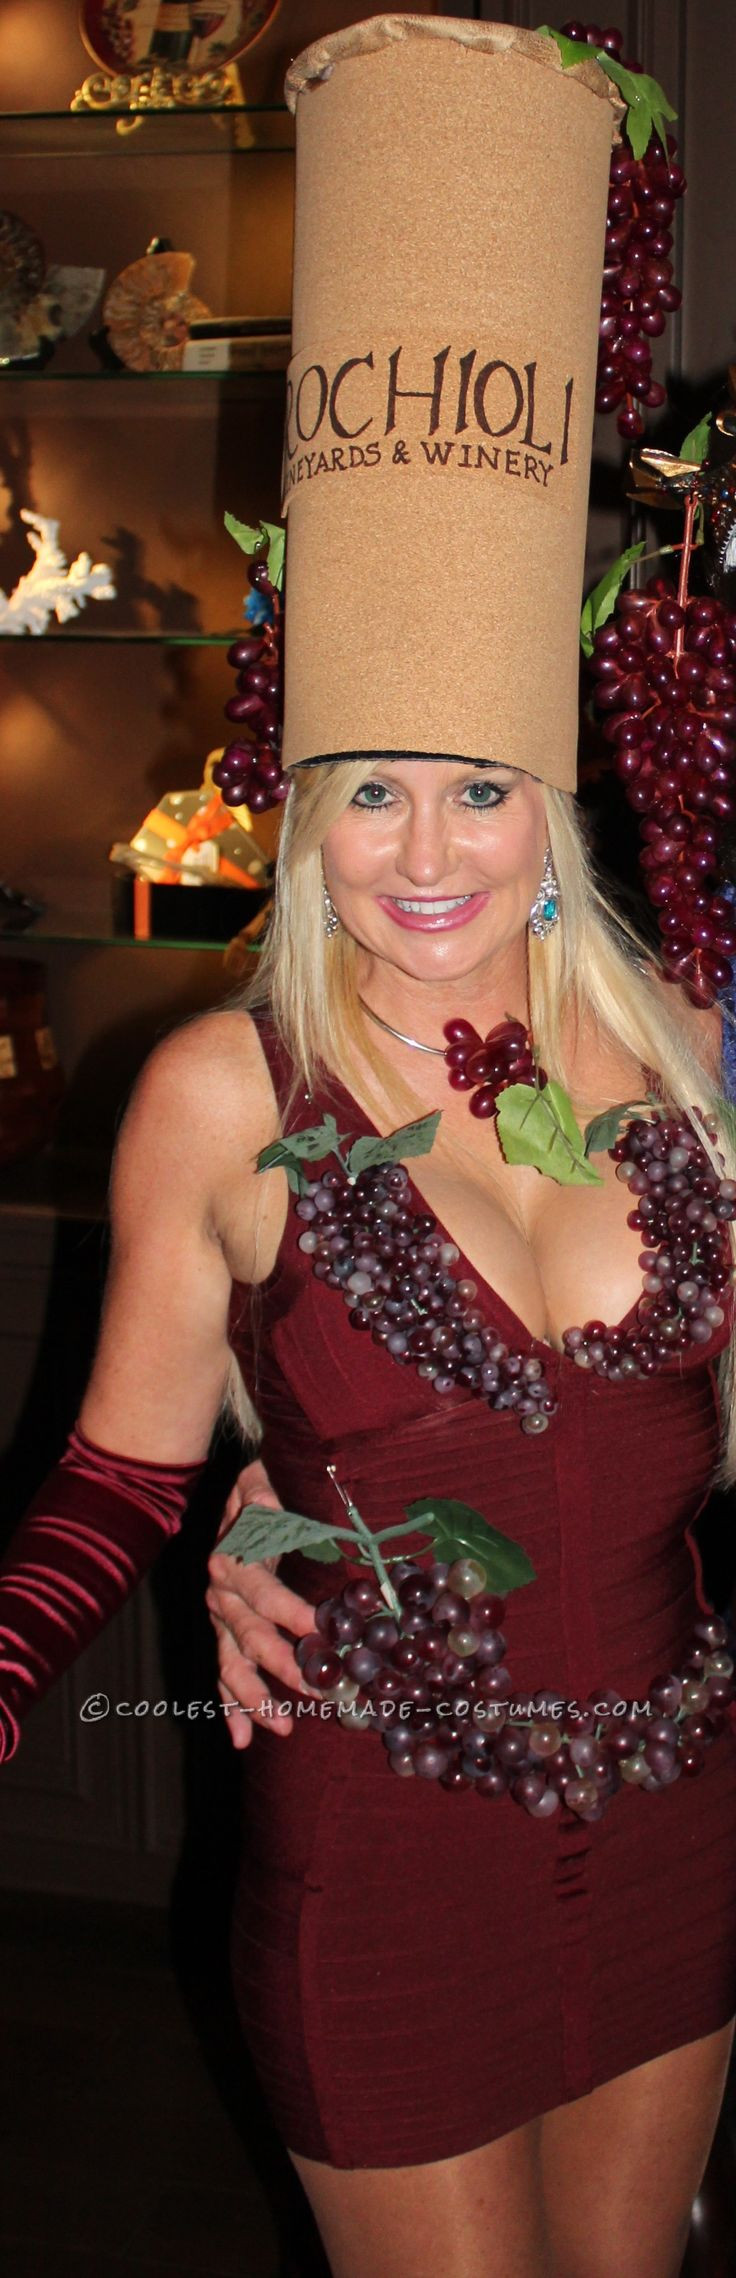 Liquor Cabinet Halloween Costumes  Best 25 Lady gaga halloween costume ideas on Pinterest